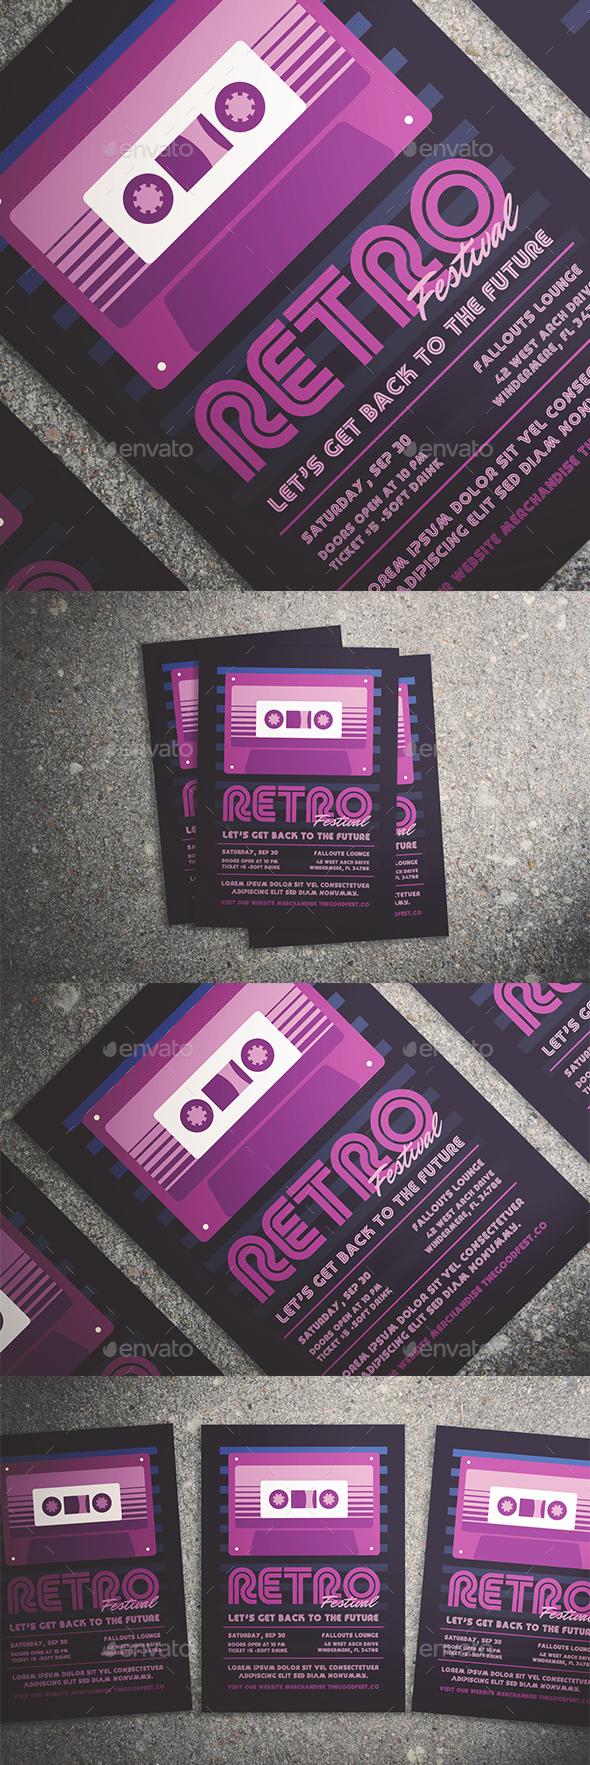 Retro Music Festival Flyer - Events Flyers